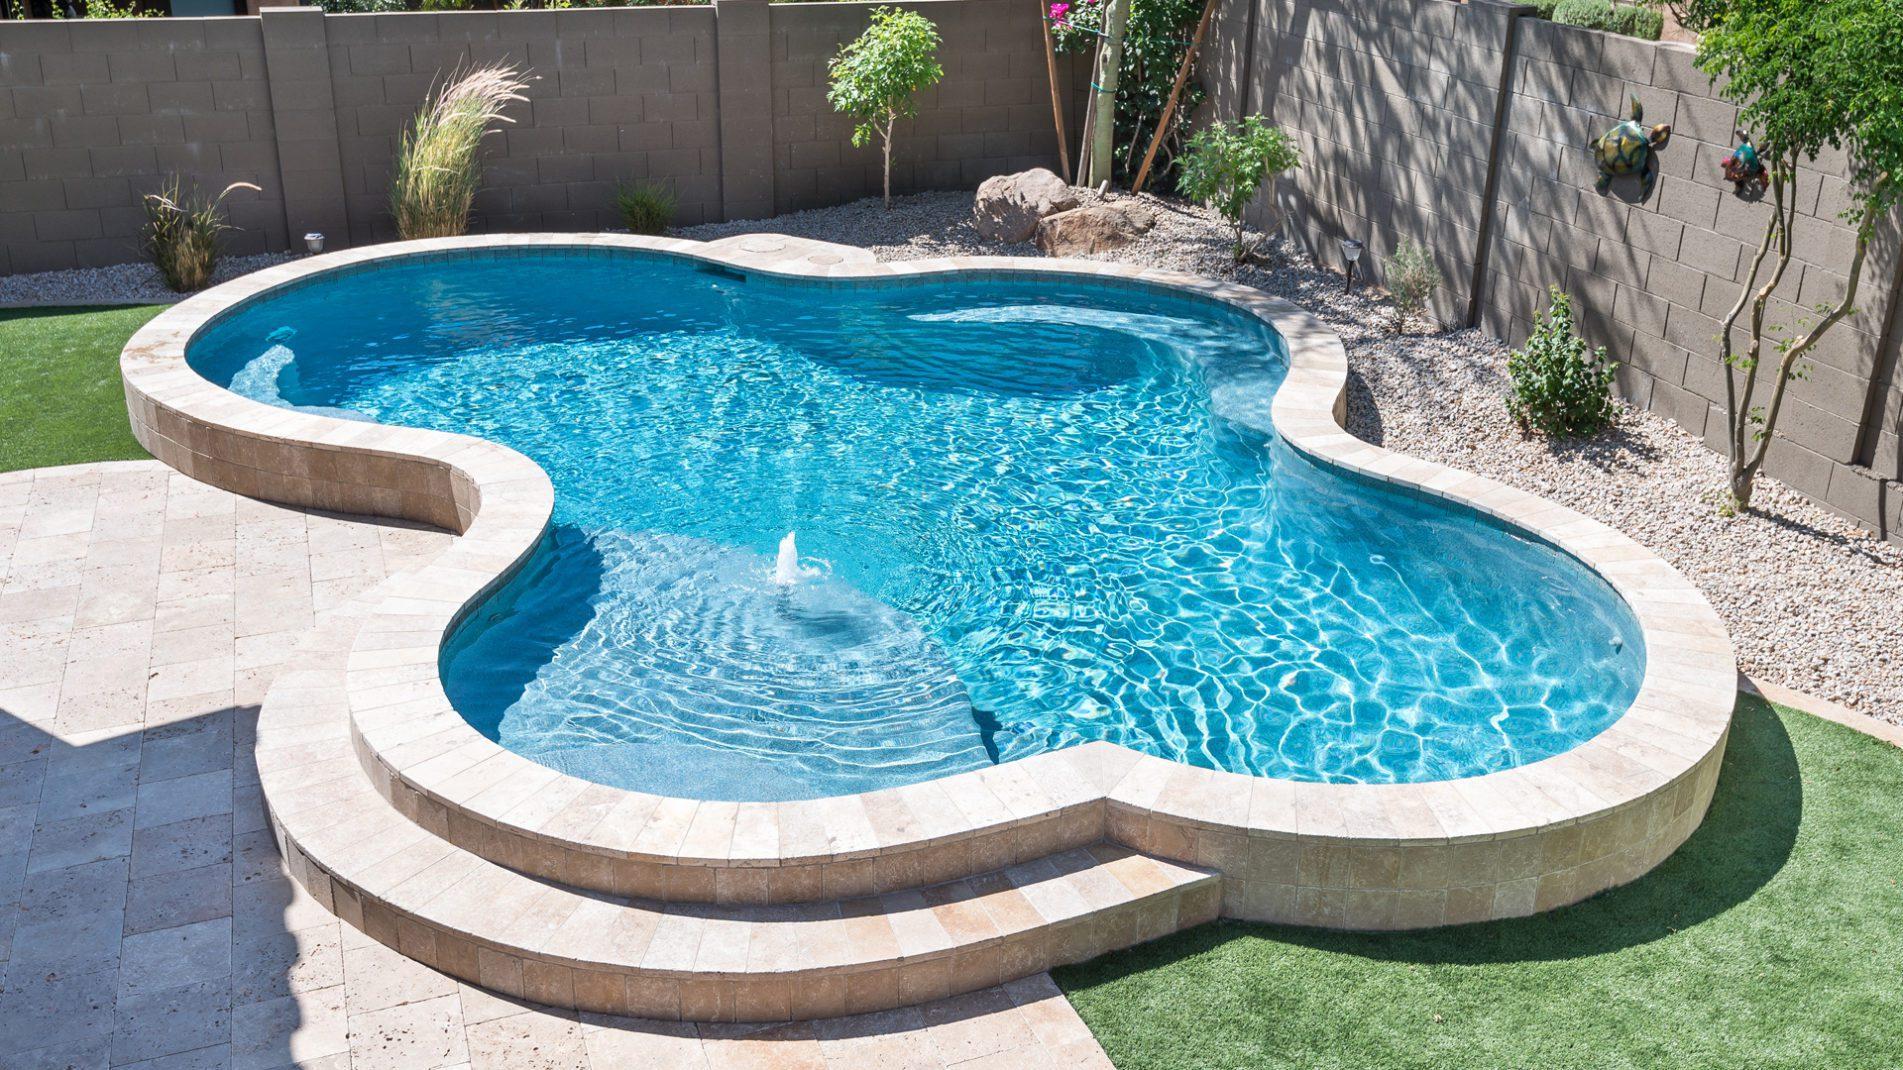 Small Backyard Pool Design Ideas: Raised Freeform Fun